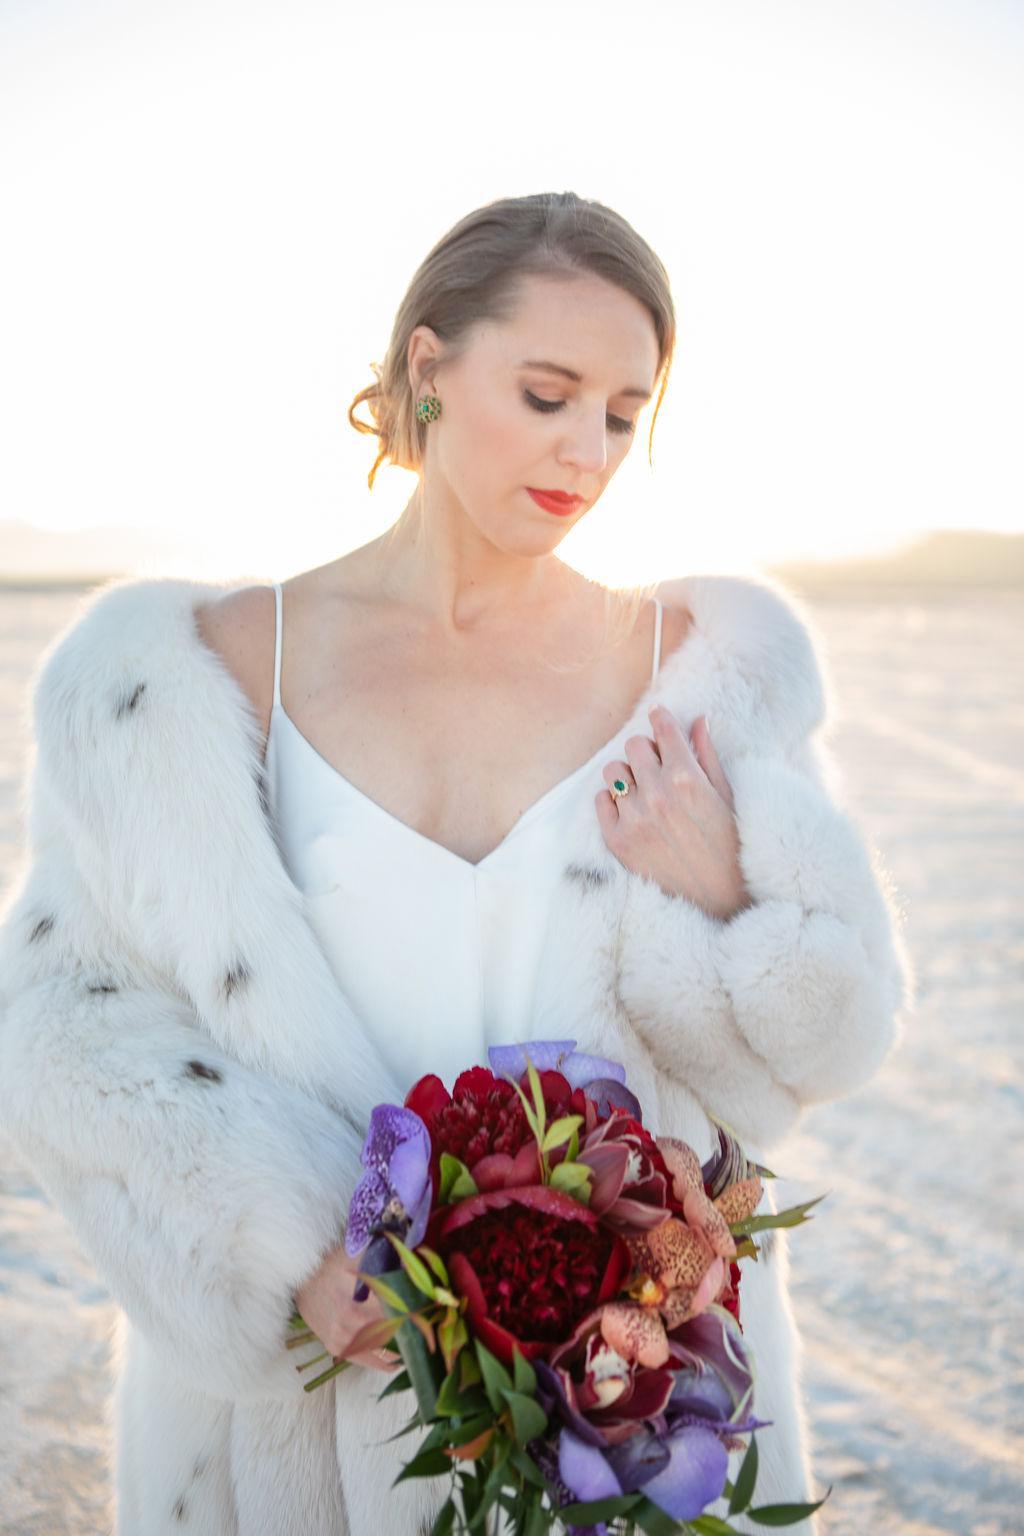 Simple Elegant Modern Goli June Luca Wedding Dress Victoria Chukarov Salt Flats Utah 20